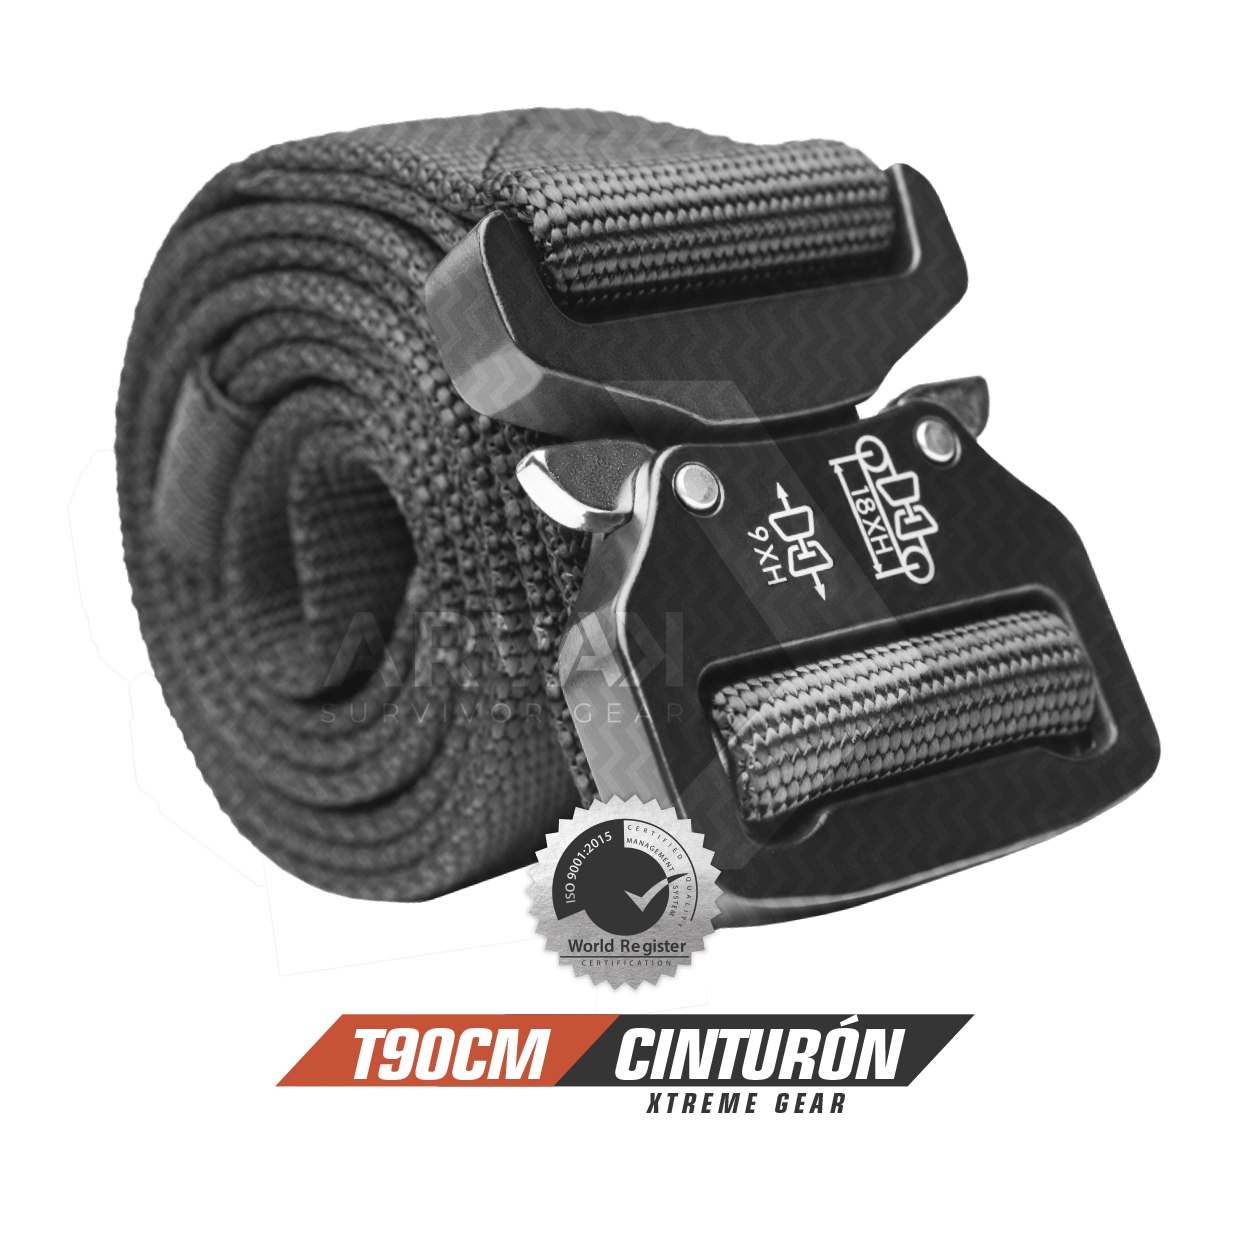 Cinturon T90CM Arvak Tactical